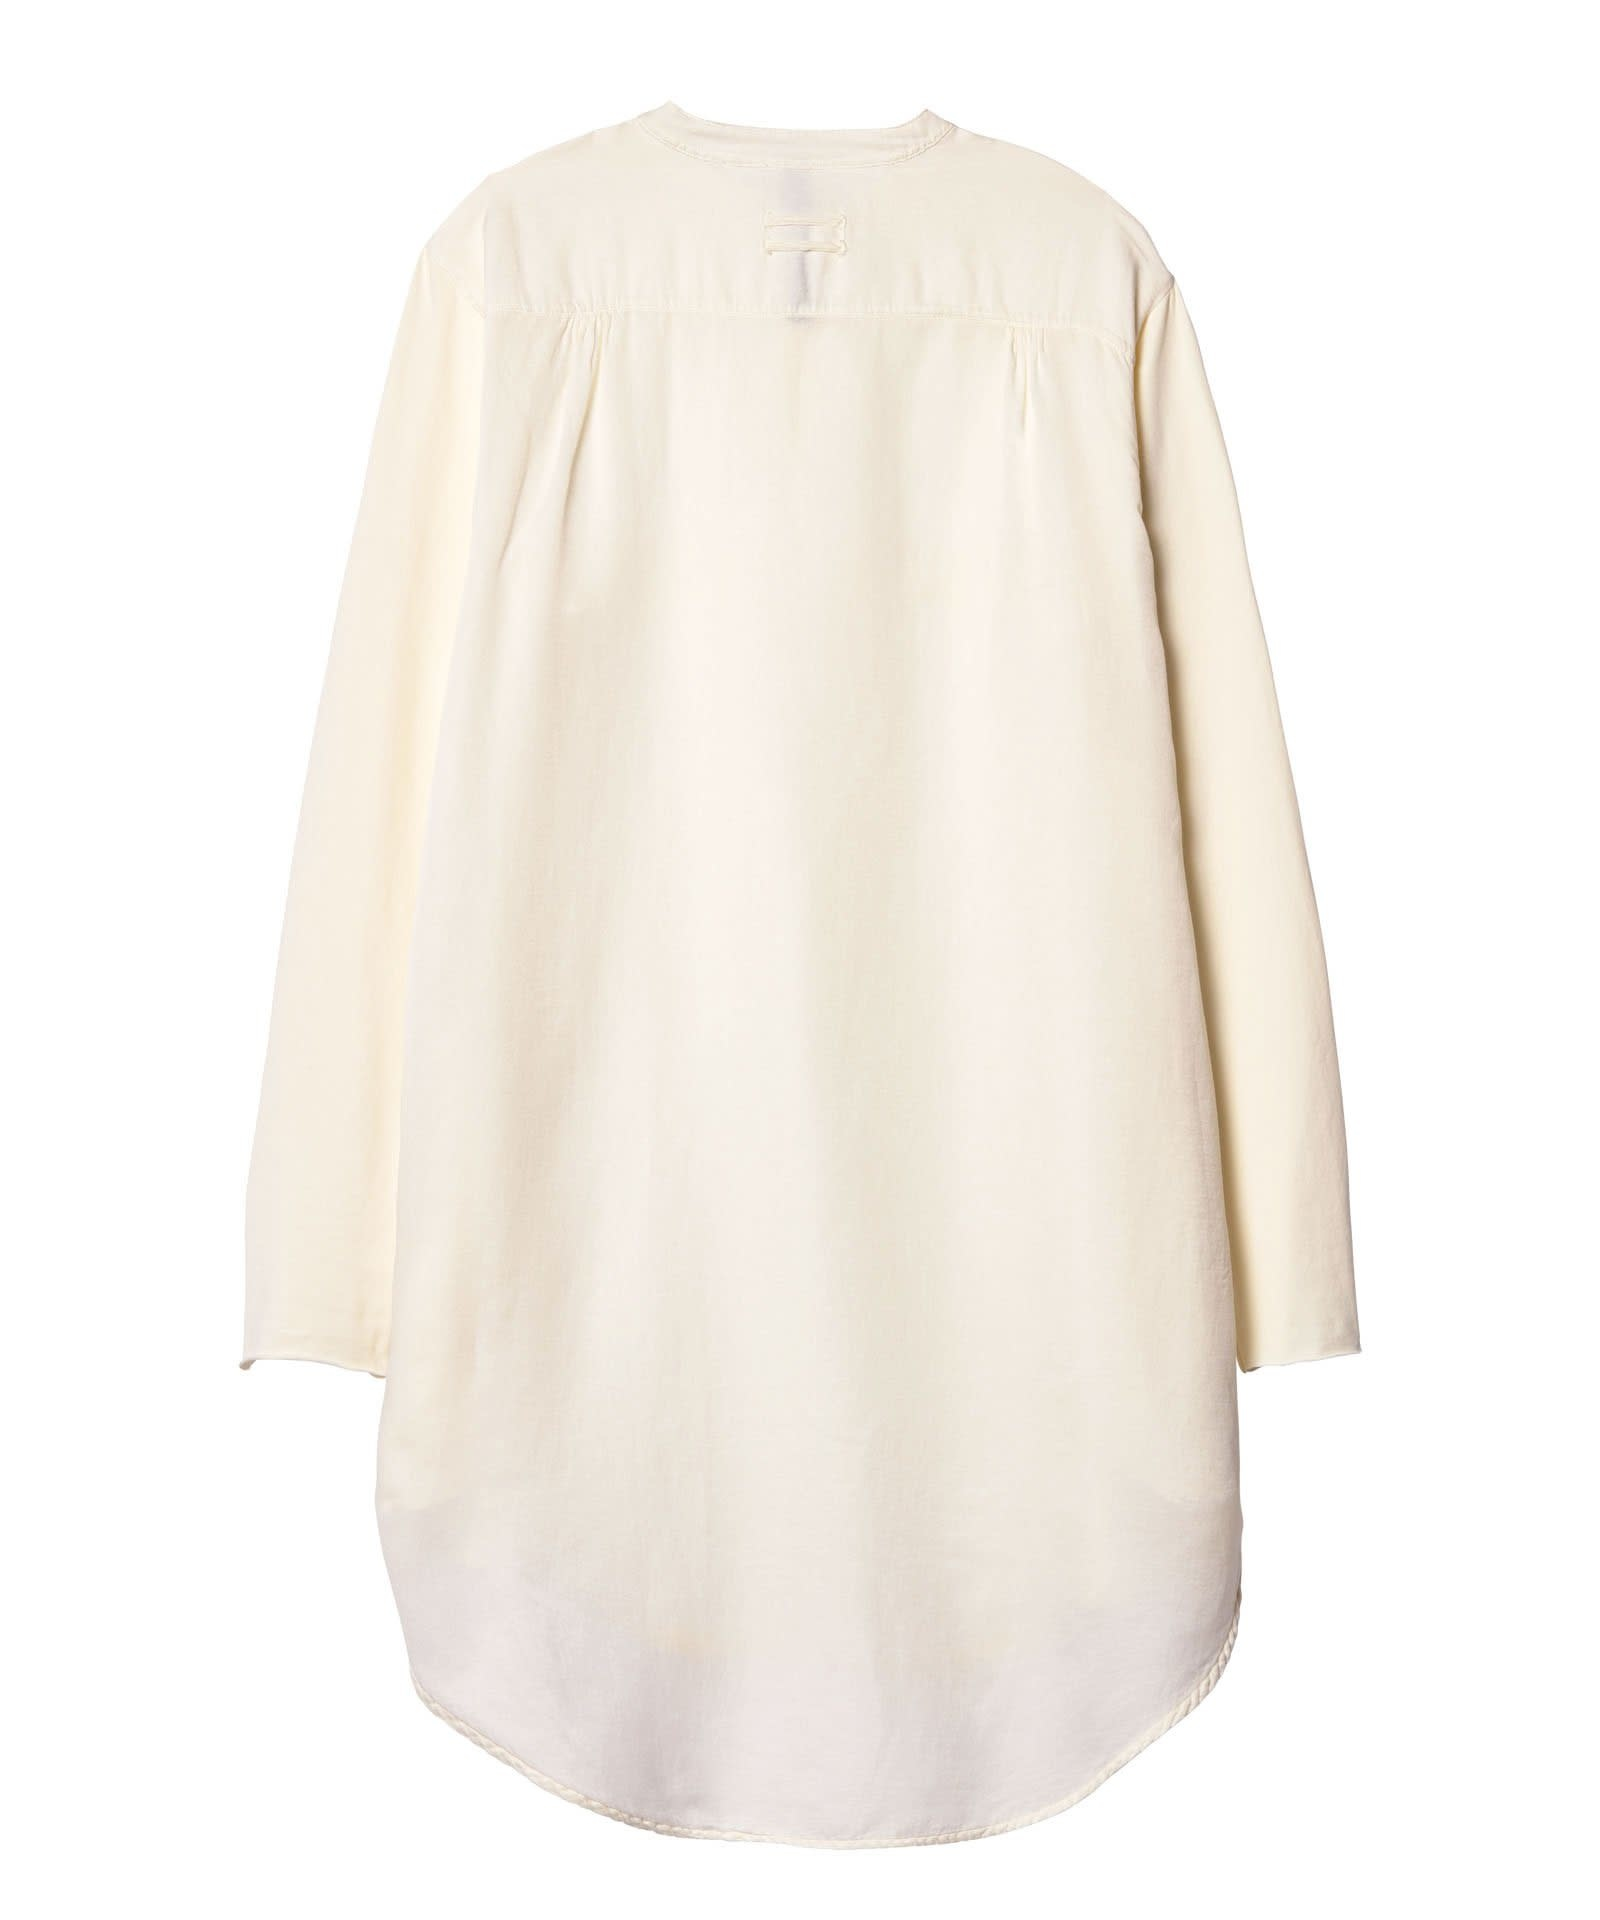 Blouse tunic silk white-3